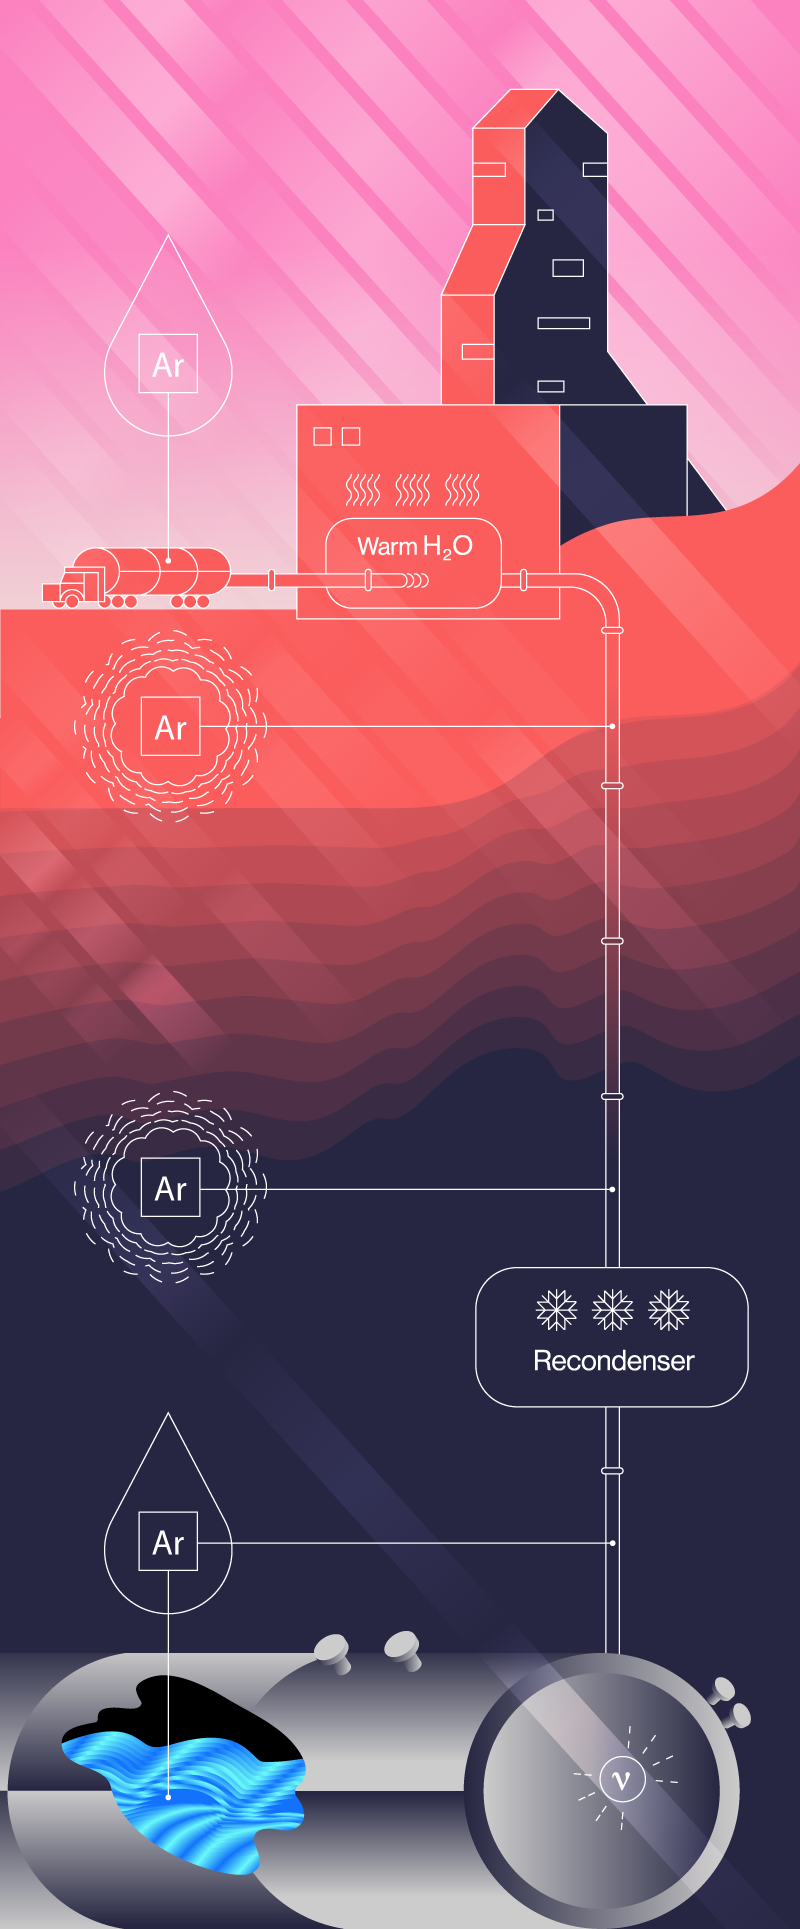 Graphic showing production of liquid argon